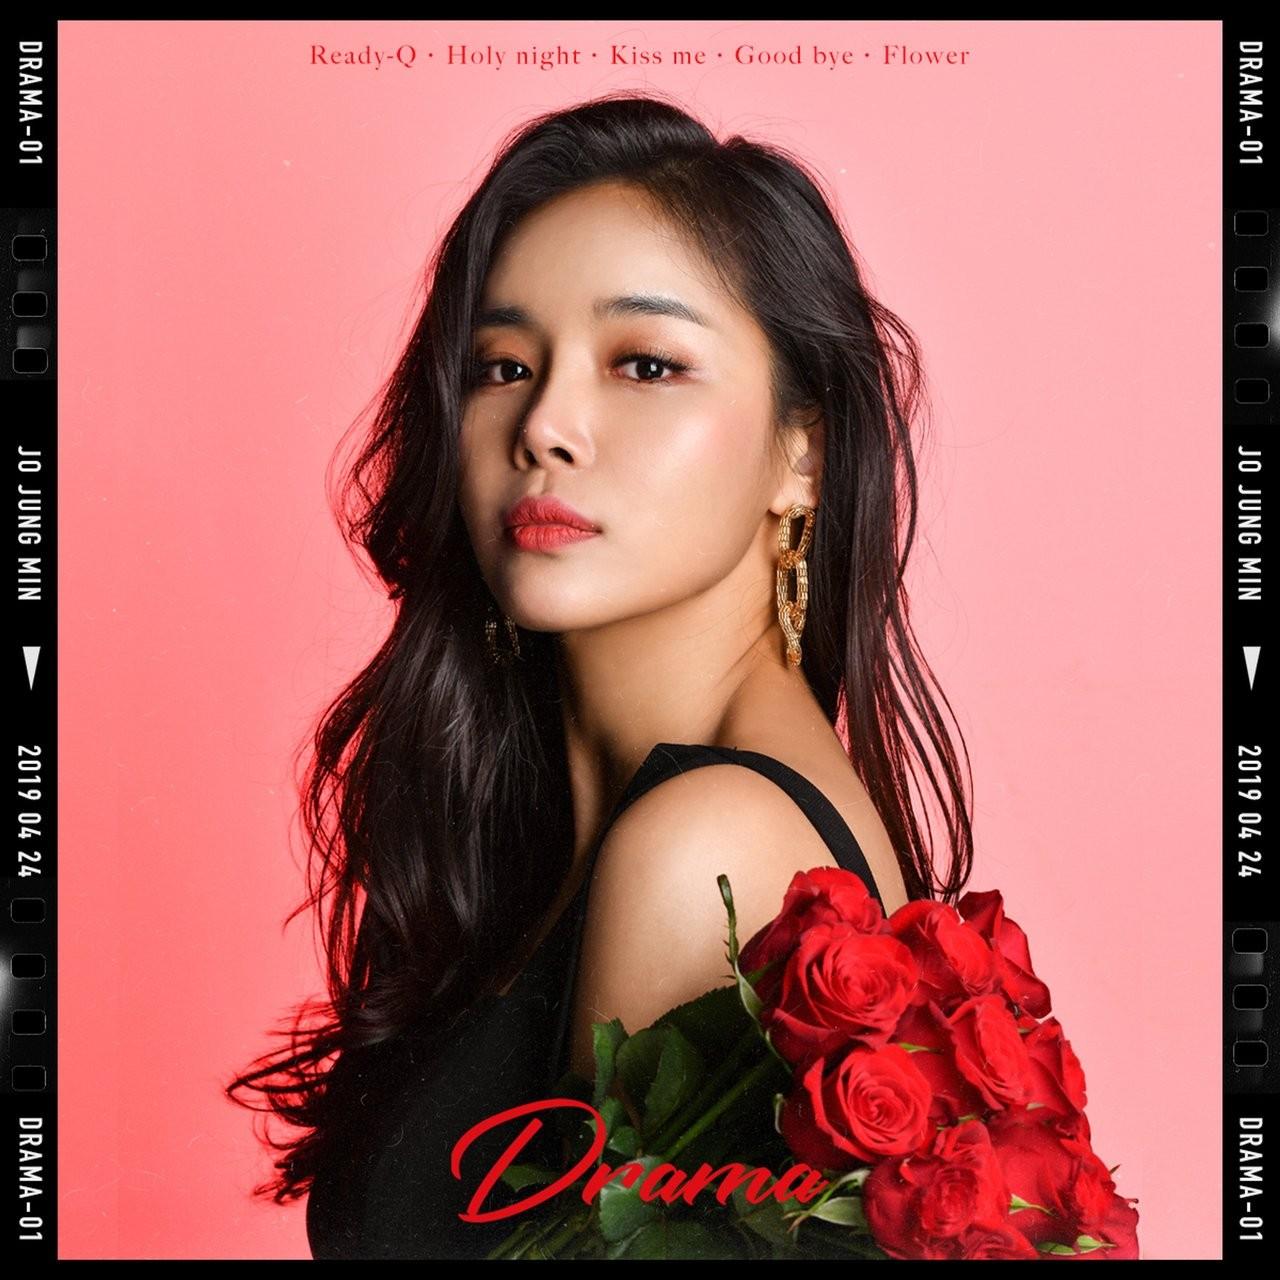 Jo Jungmin (조정민) – Drama [FLAC + MP3 320 / WEB] [2019.04.24]